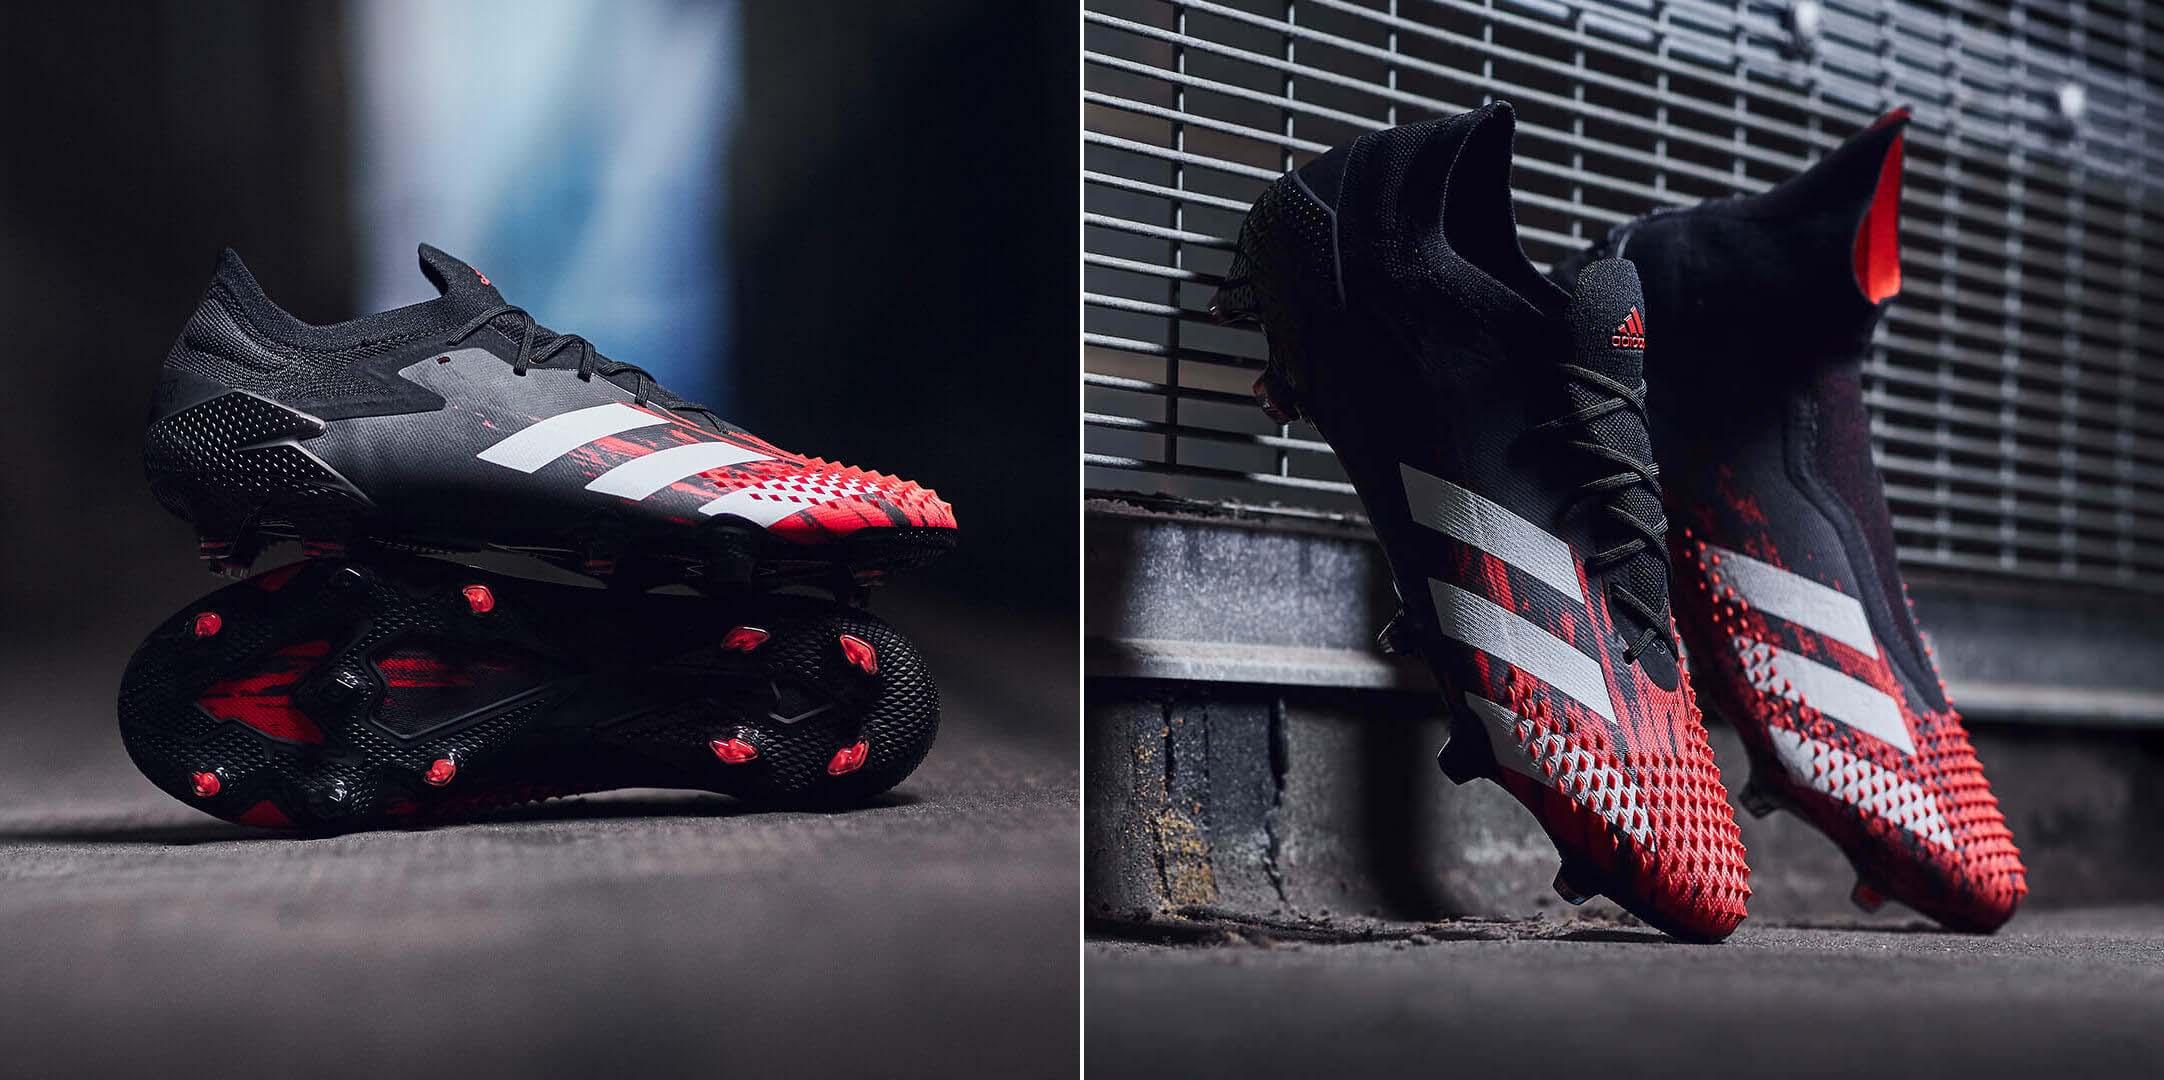 Adidas Predator 20+ cổ cao và Adidas Predator 20.1 bản không cổ